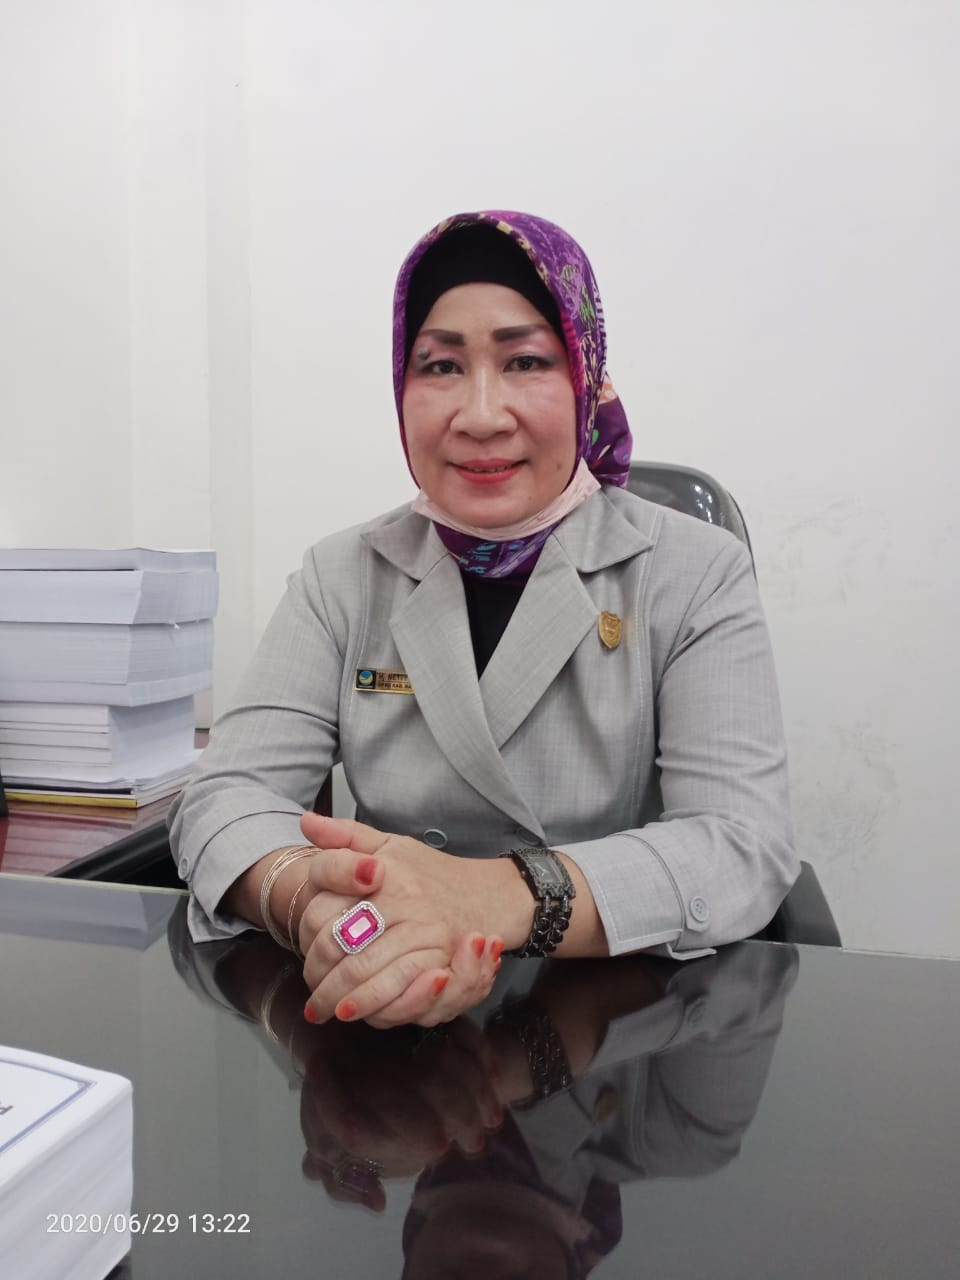 Anggota Komisi I DPRD Barut Himbau Warga Patuhi Protokol Covid19.